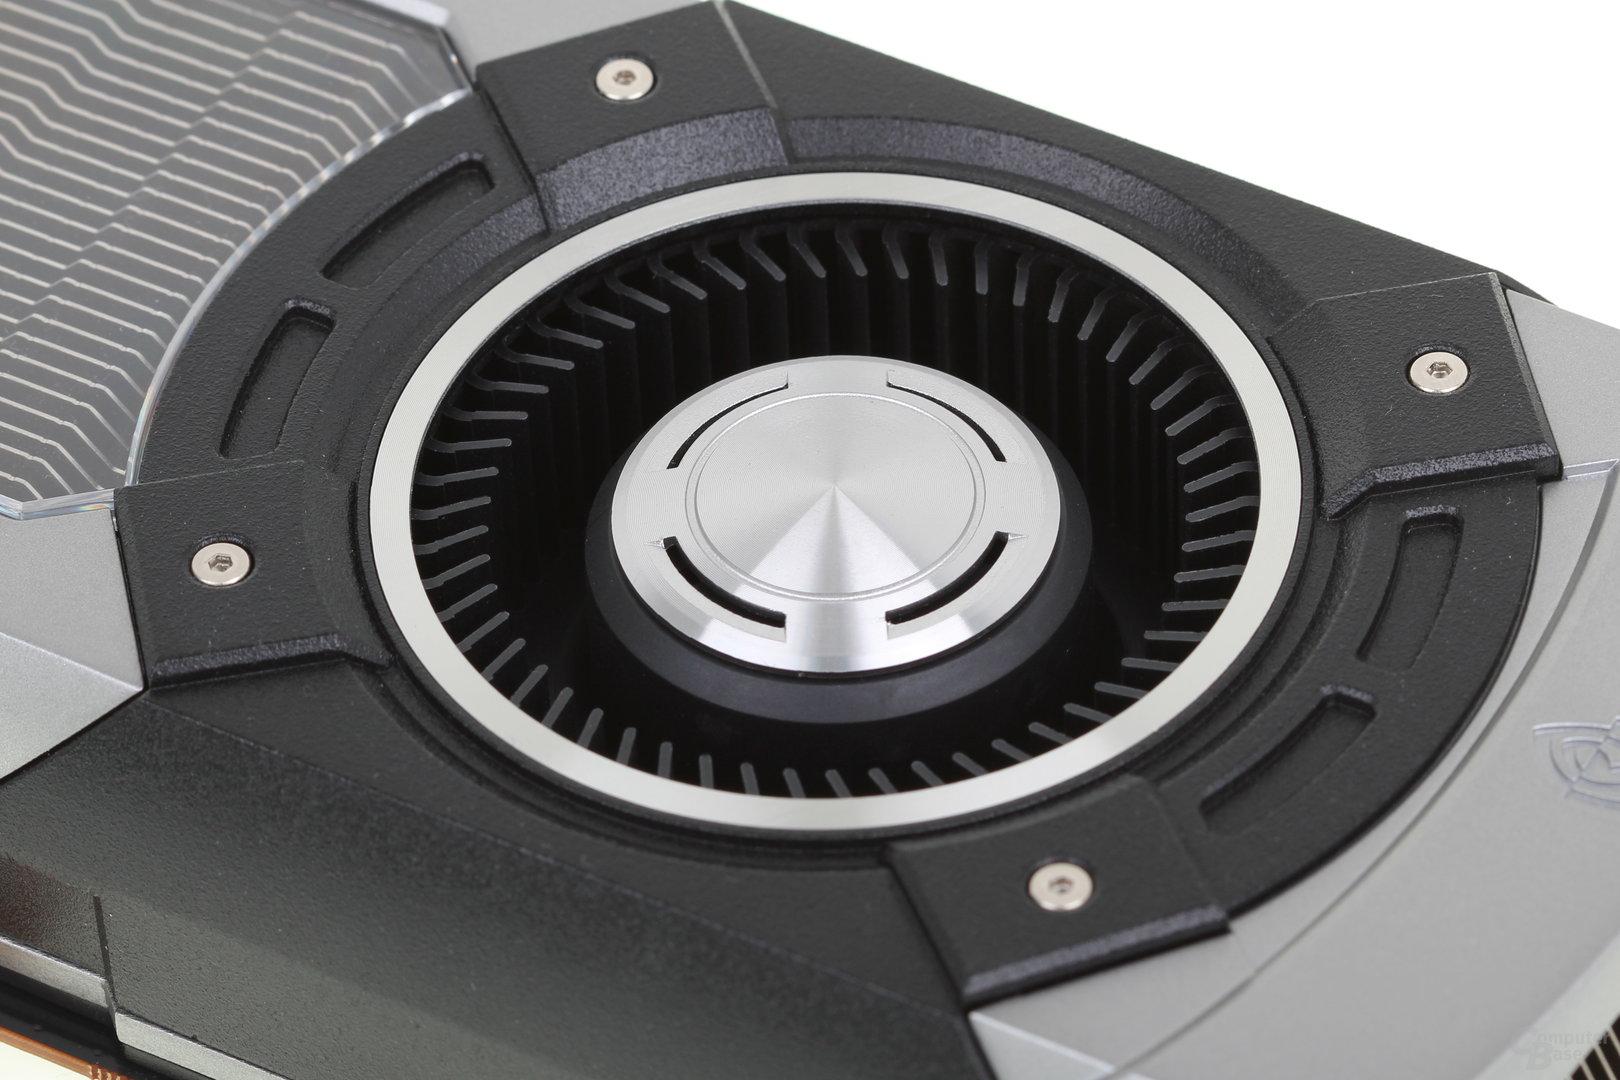 Nvidia GeForce GTX 780 – Lüfter